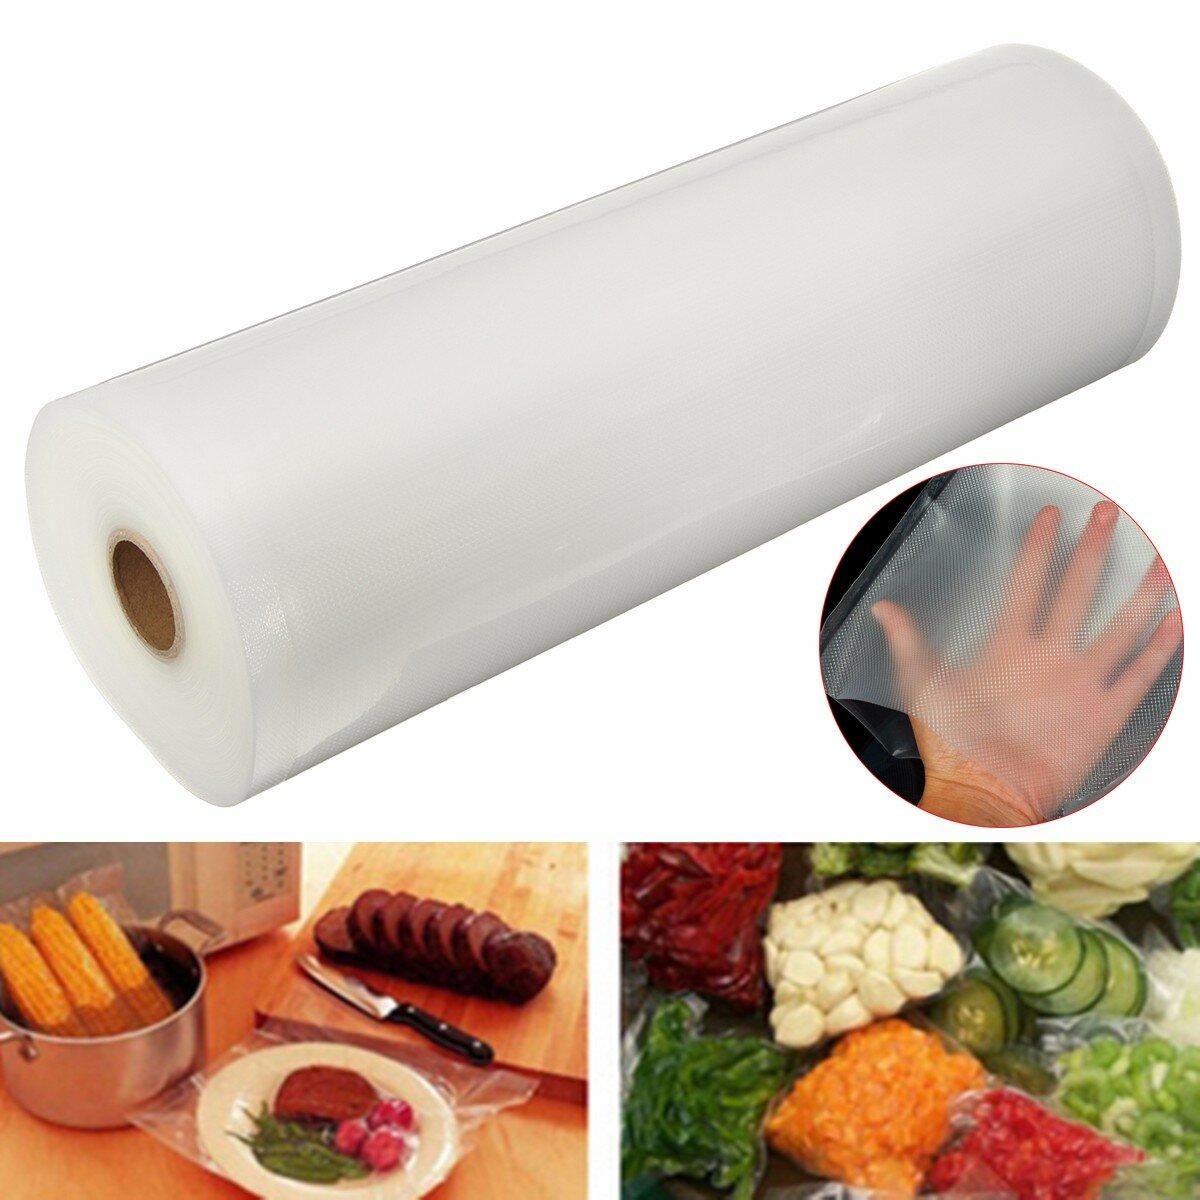 Big size 28x1500cm vacuum sealing roll bag storage food saver big size 28x1500cm vacuum sealing roll bag storage food saver kitchen plastic heat seal bags freeze fandeluxe Choice Image